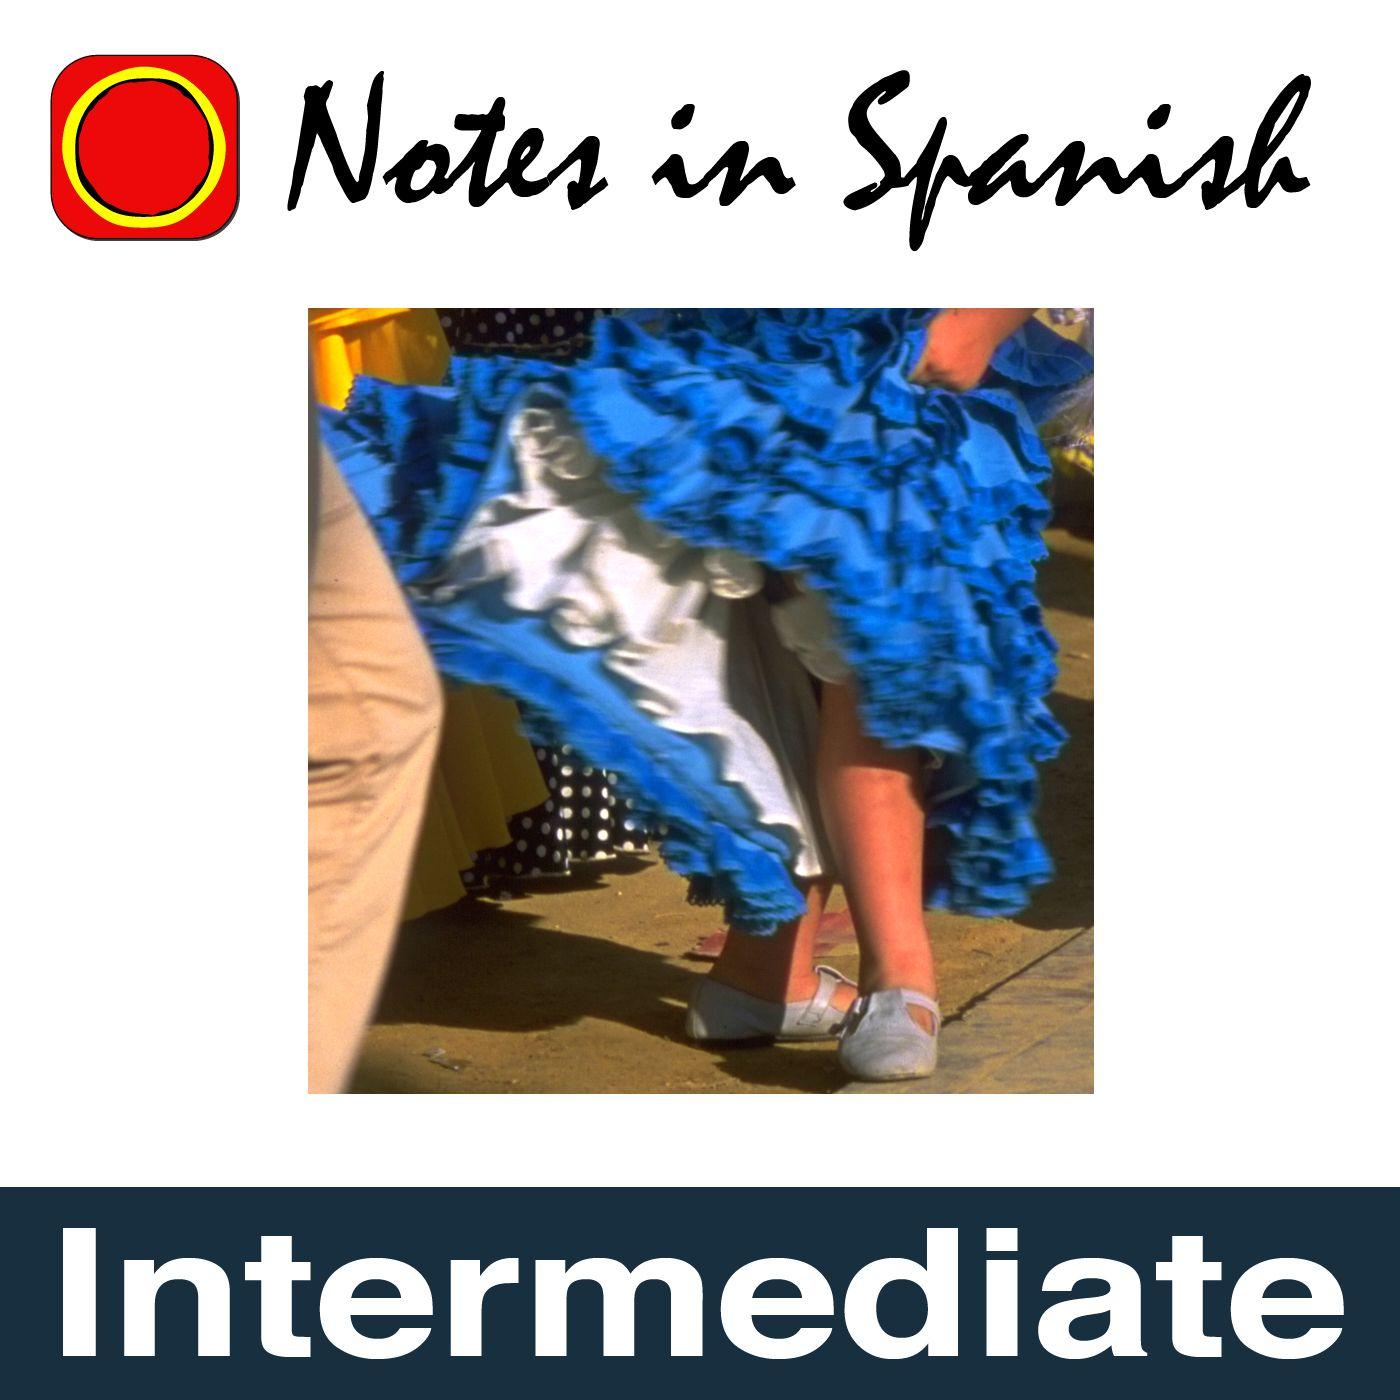 Notes In Spanish Intermediate A Podcast For Intermediate